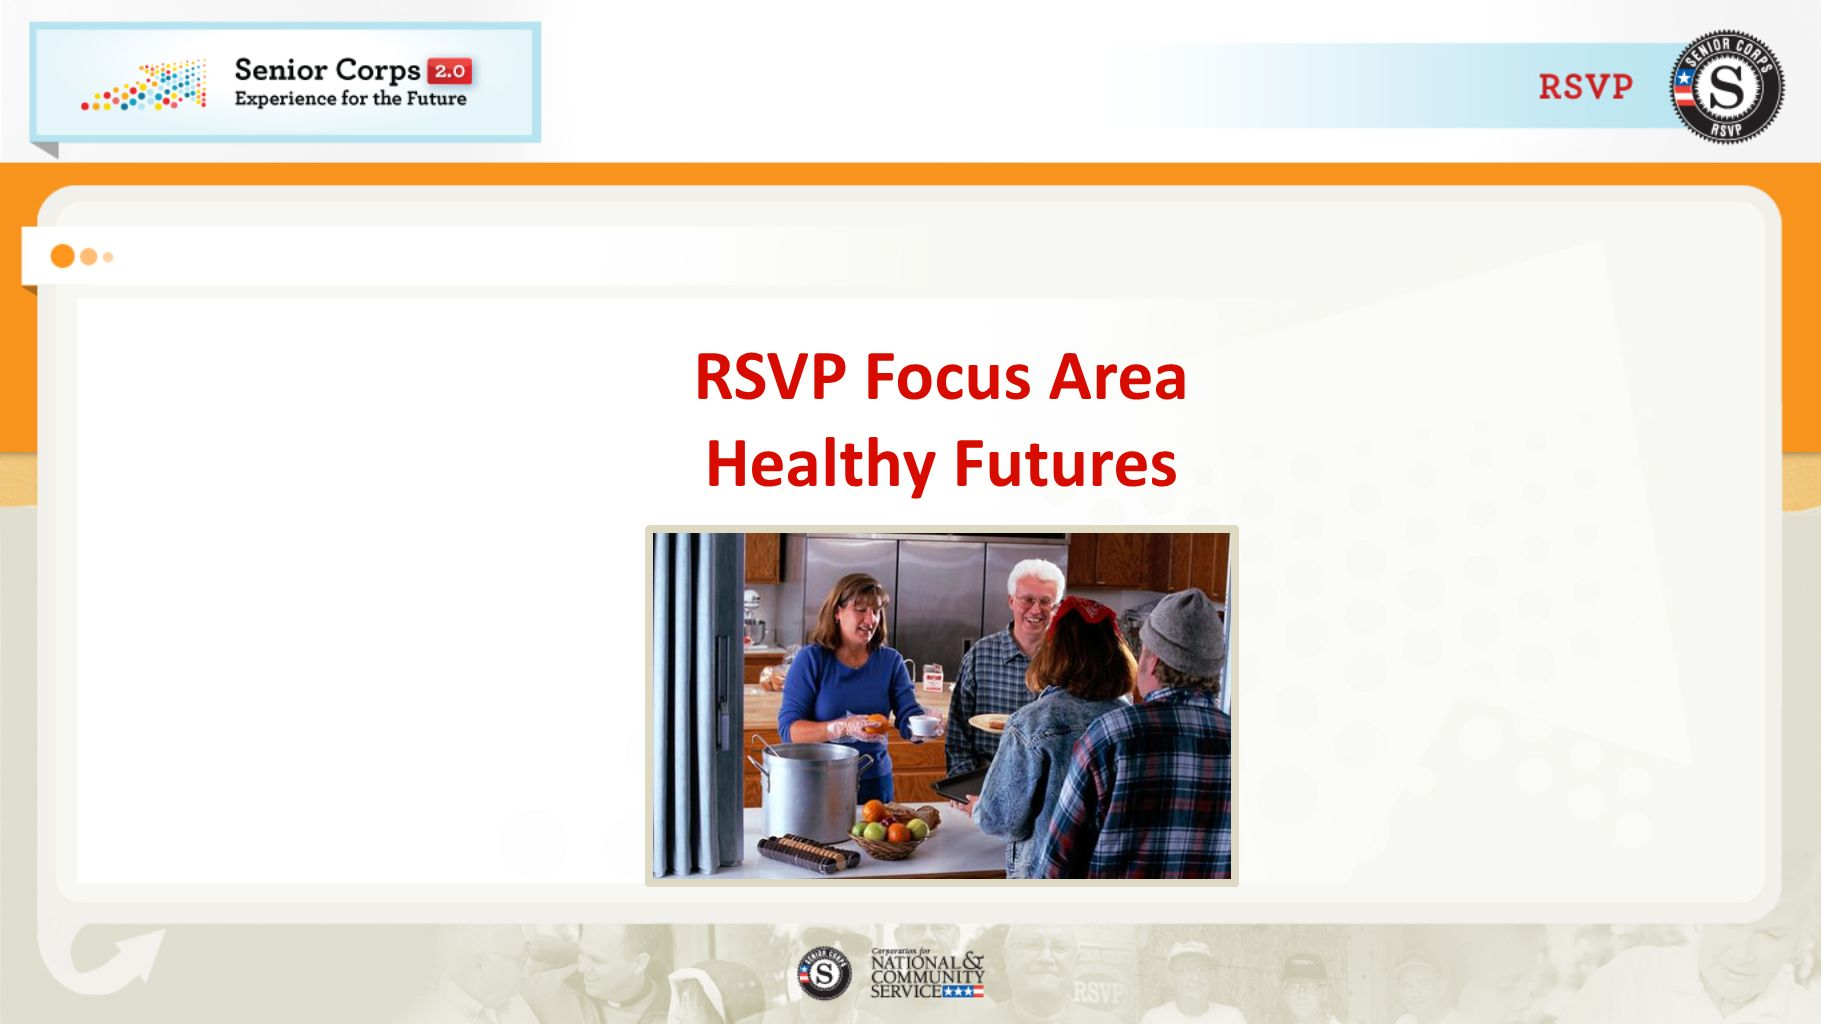 RSVP Focus Area Healthy Futures